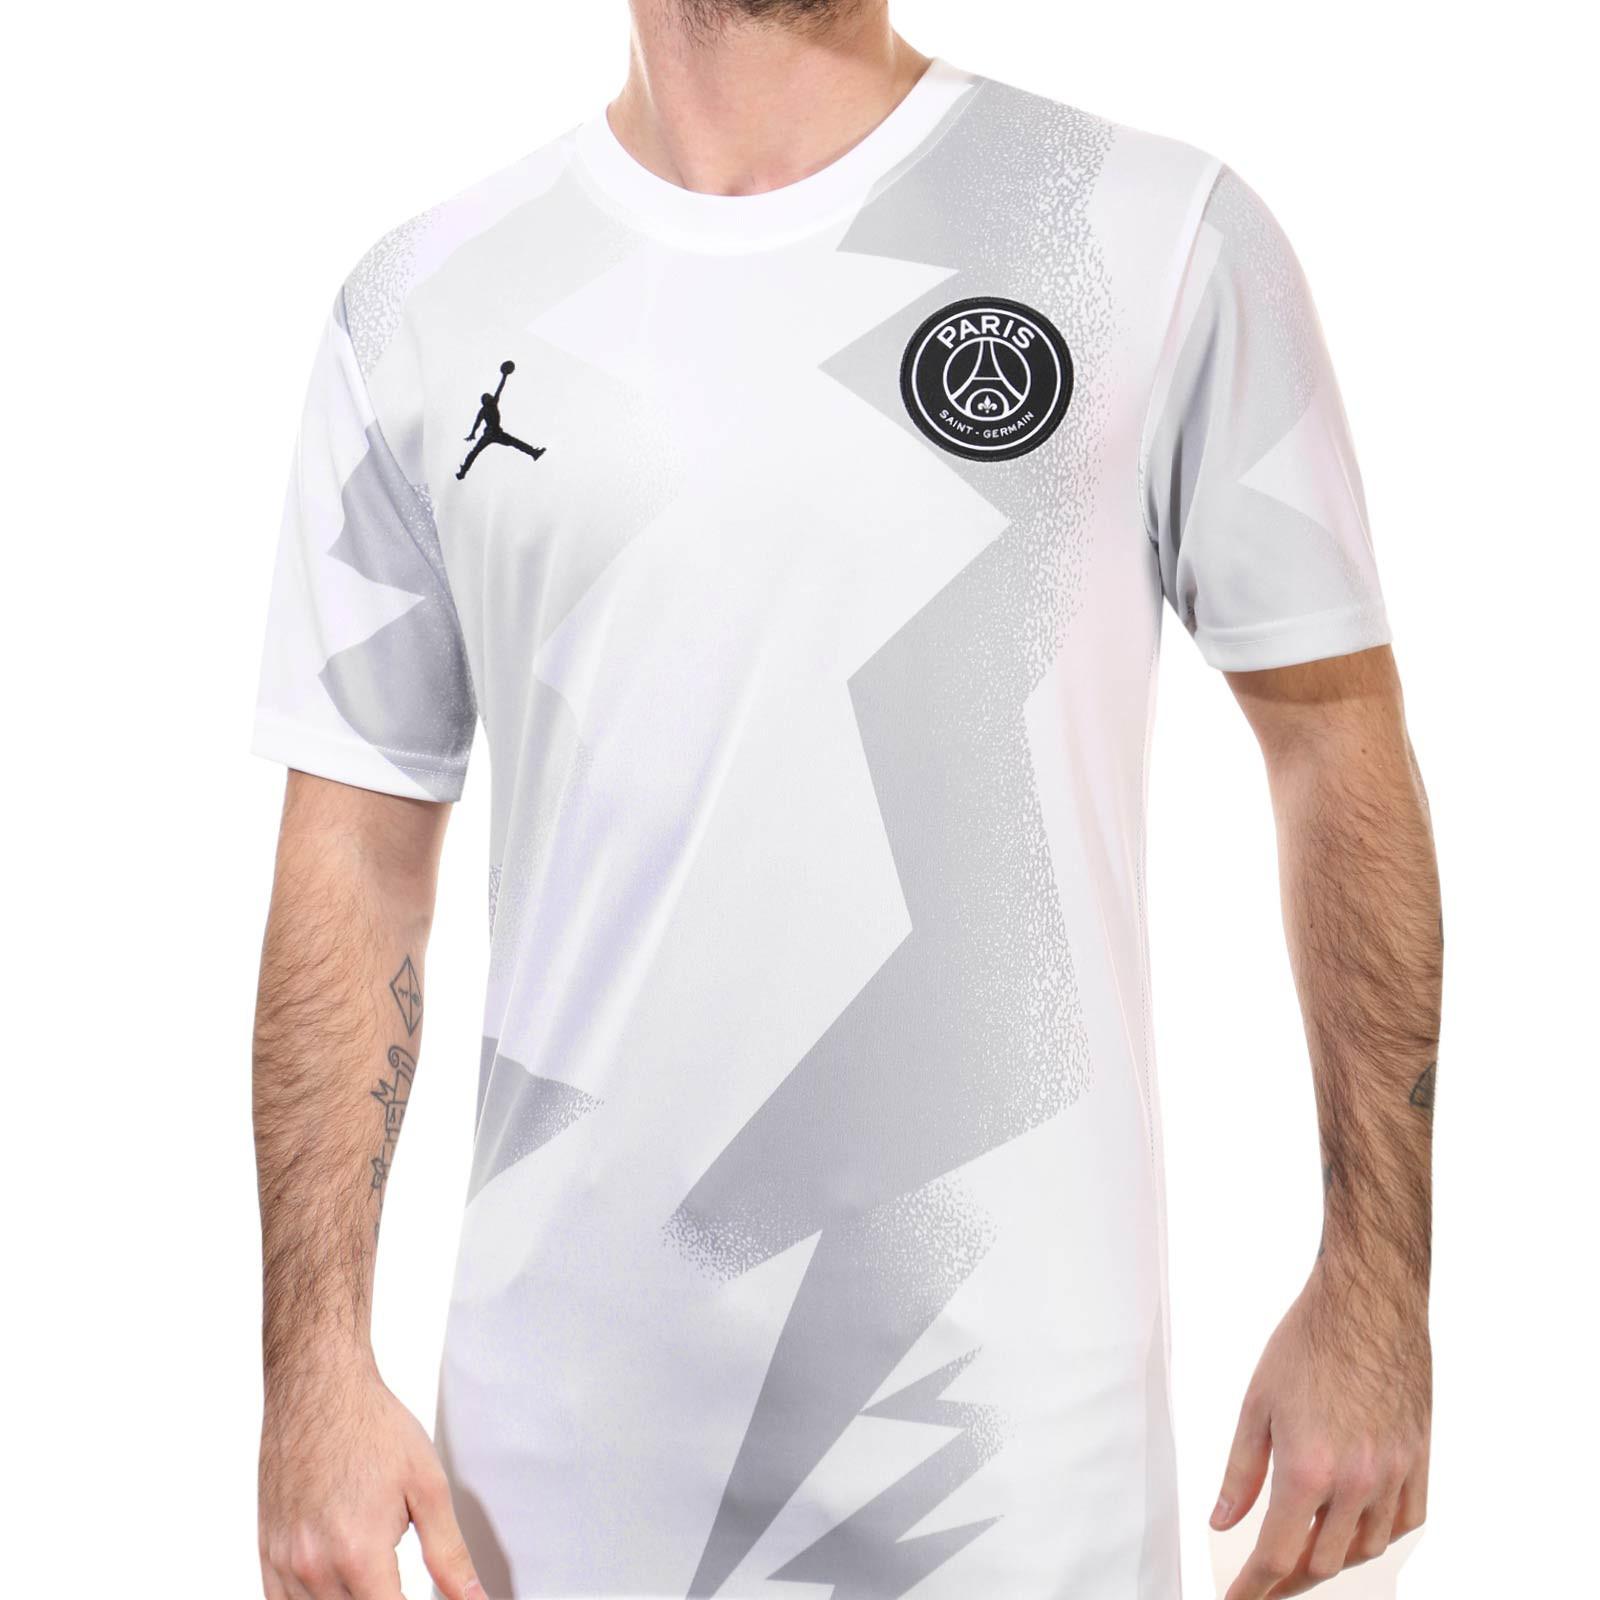 Camiseta Nike 4a PSG x Jordan pre match 19 2020